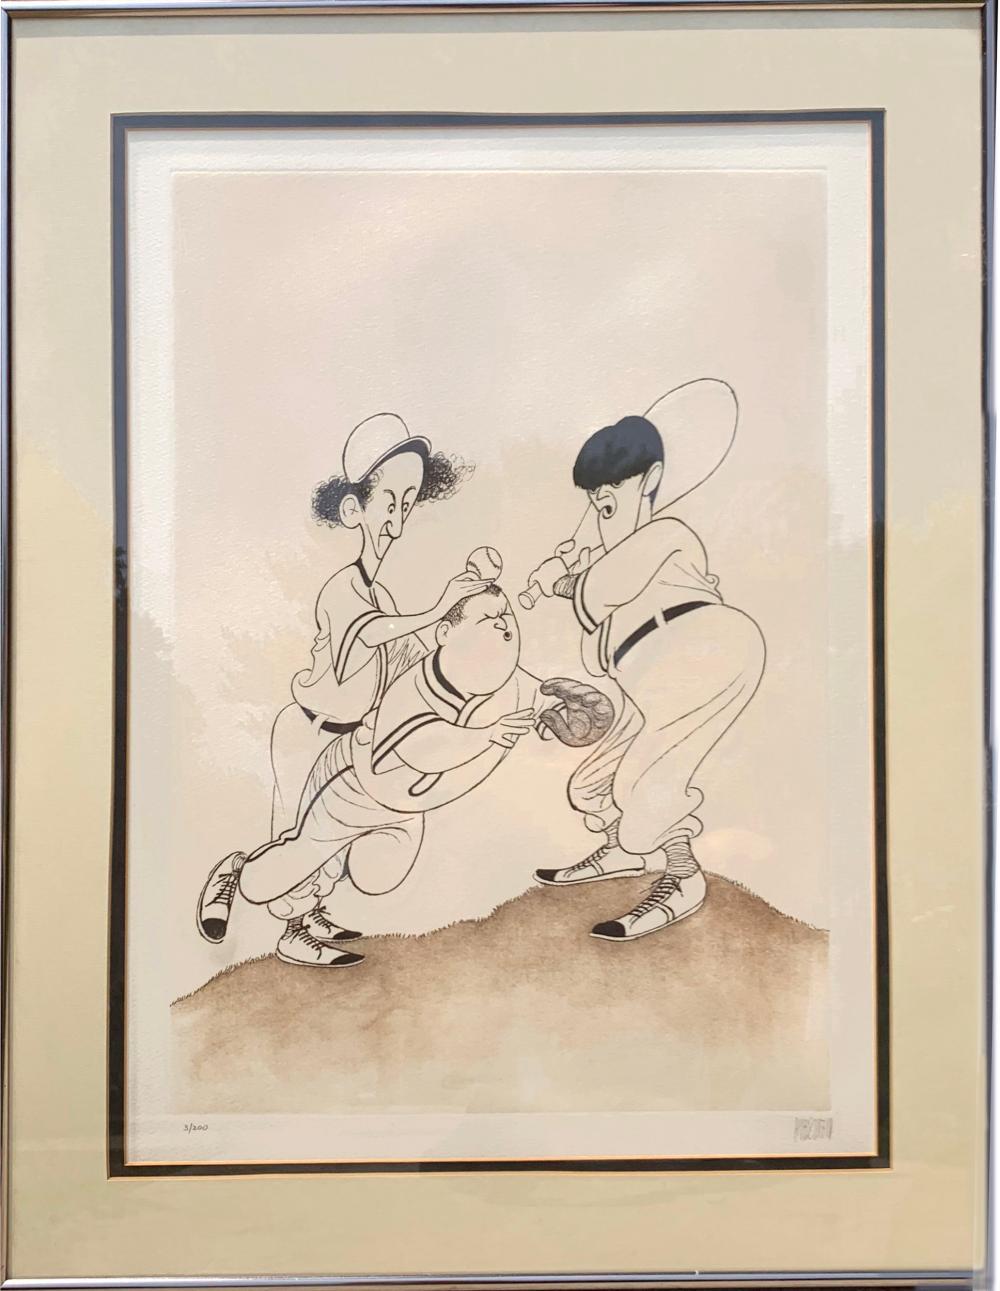 Al Hirschfeld, The Three Stooges (Baseball), Etching